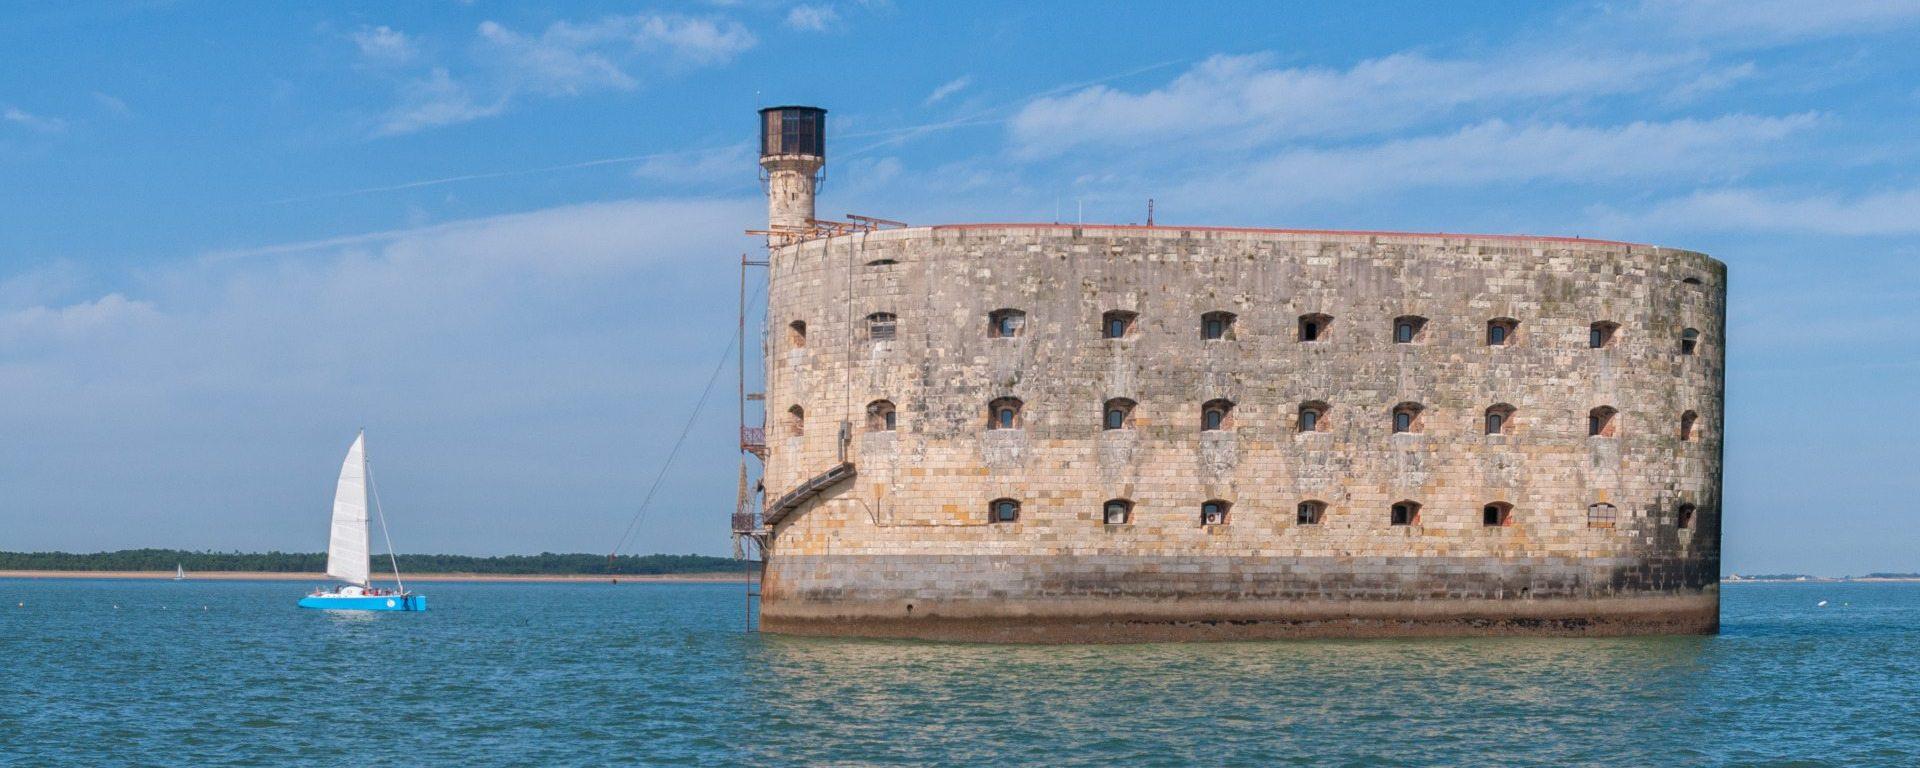 rochefort-ocean-fort-boyardvincent-edwell11-1-aspect-ratio-2000-800